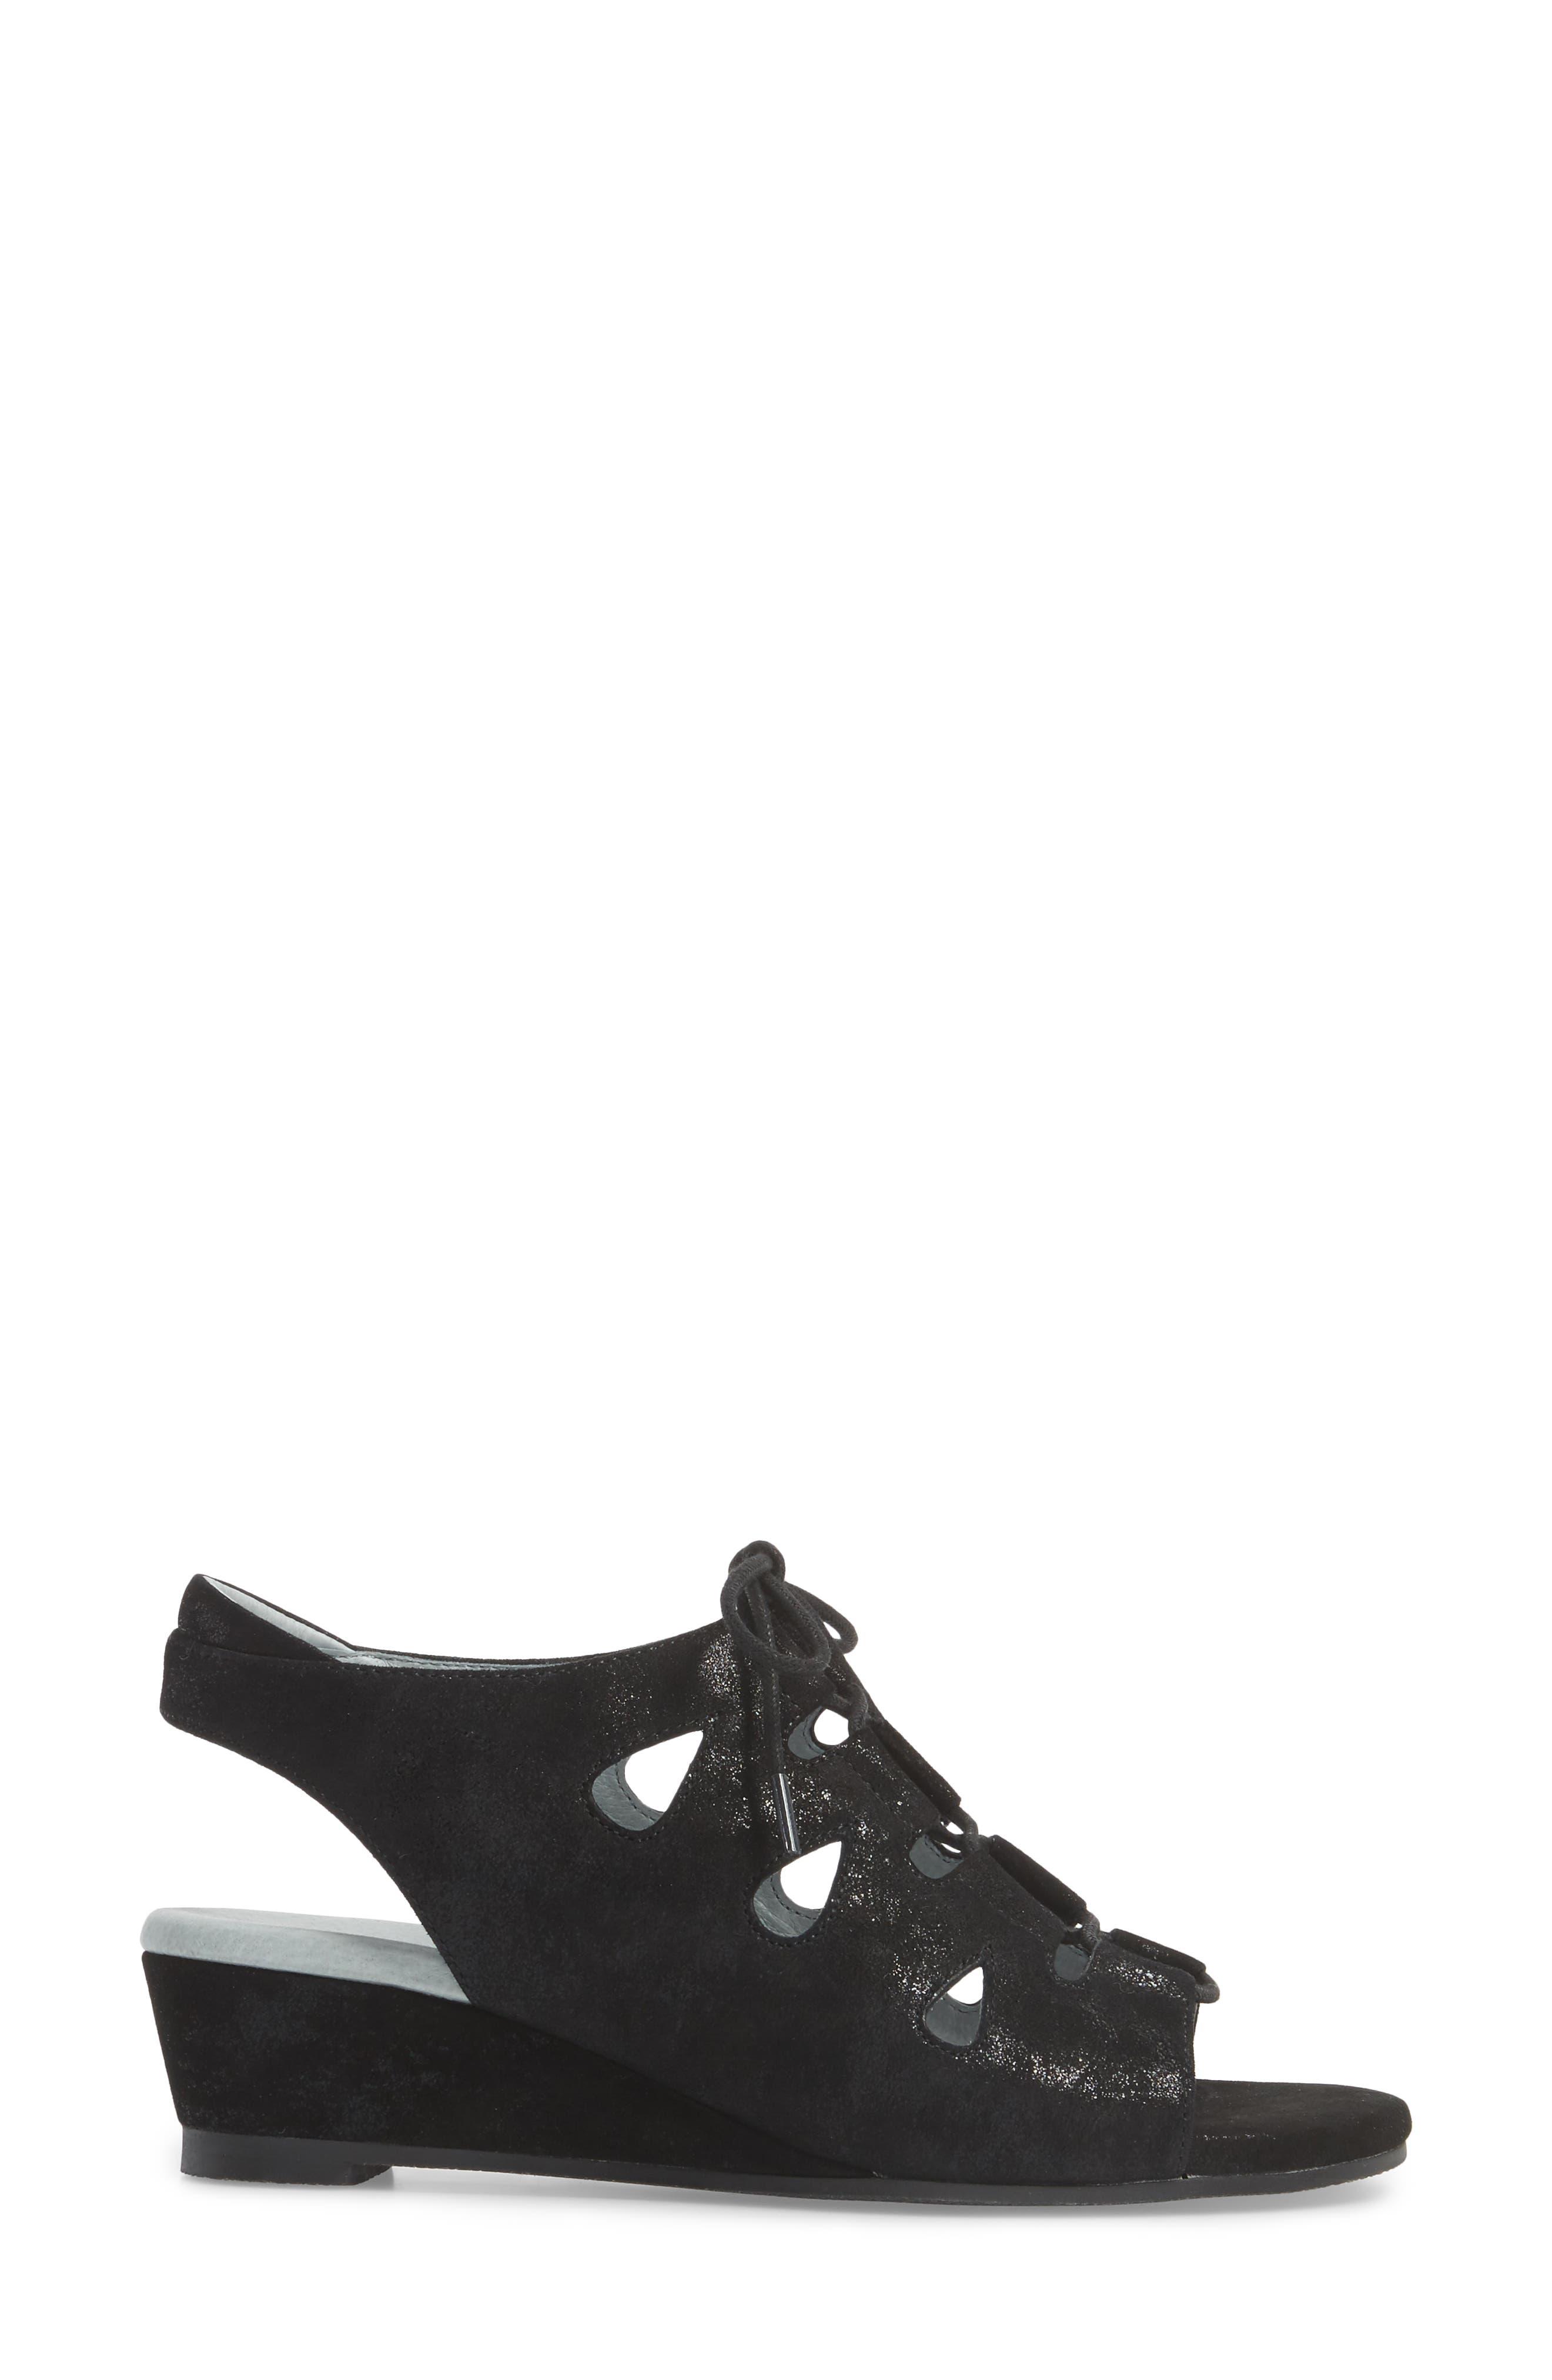 DAVID TATE, Rich Wedge Sandal, Alternate thumbnail 3, color, BLACK SUEDE